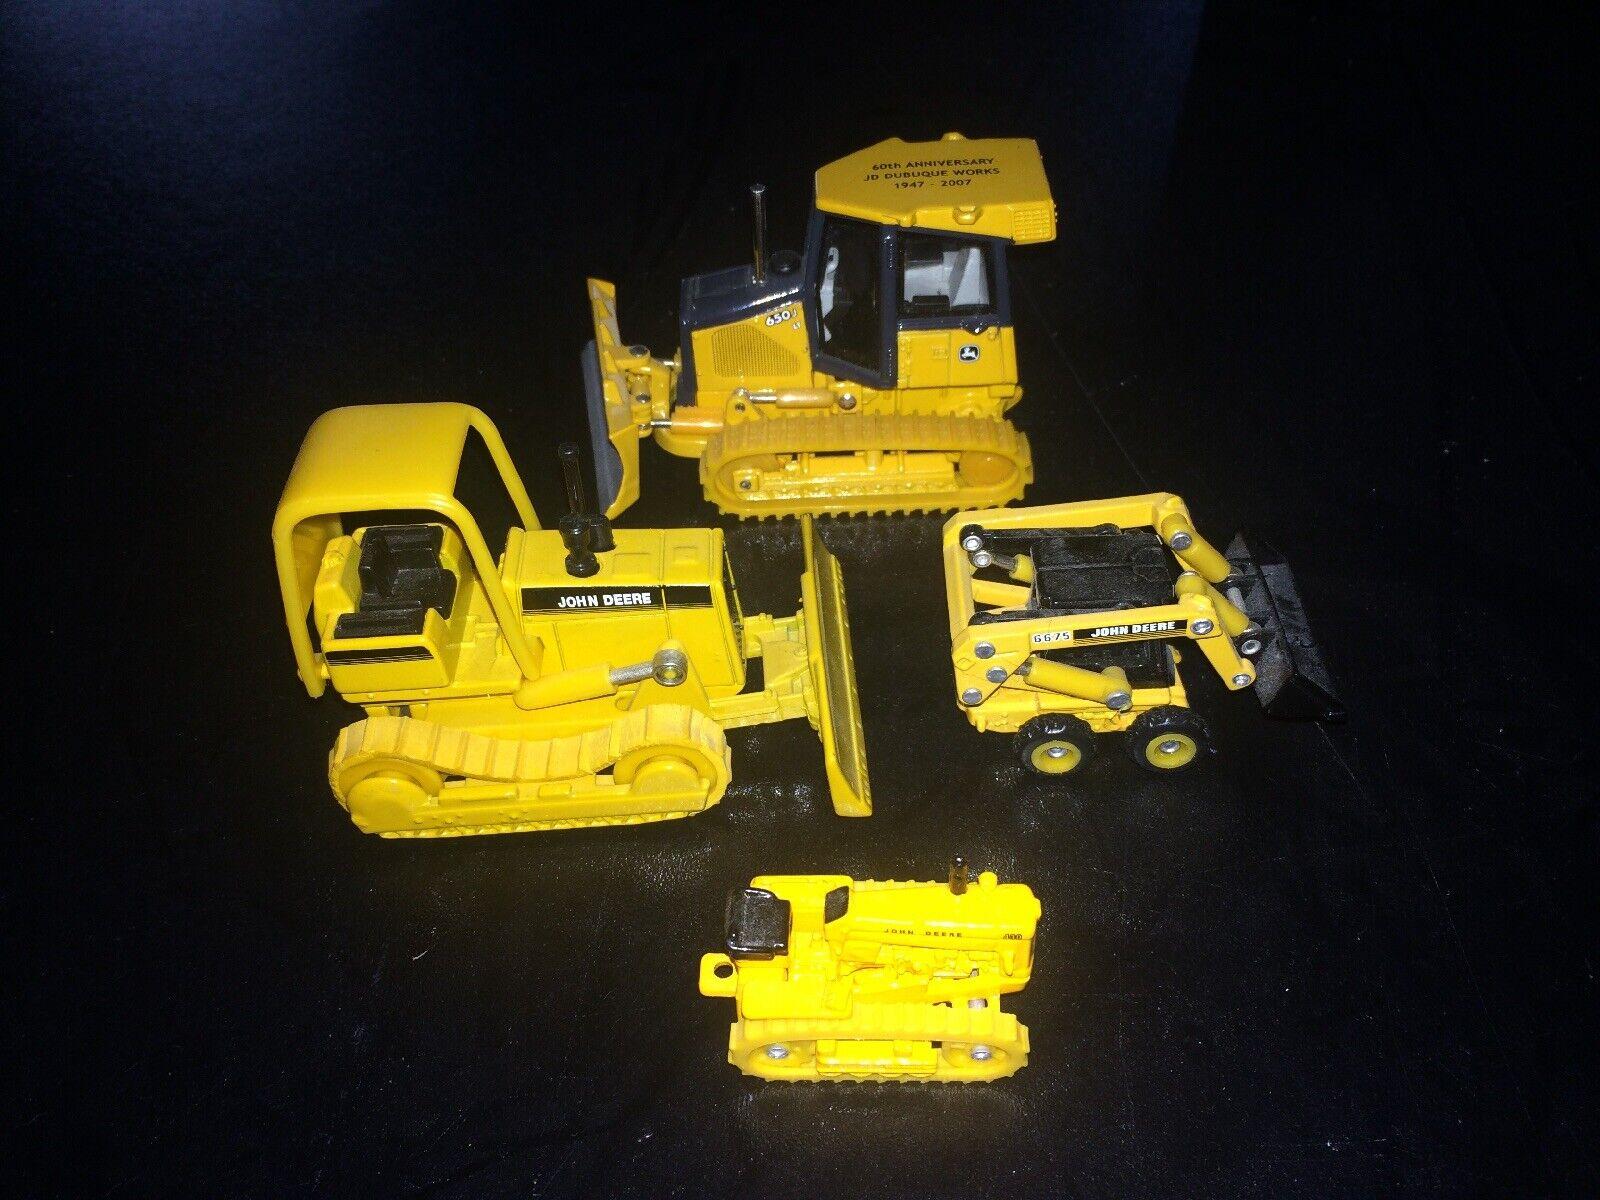 Rare Ertl John Deere Construction Toy Lot Bulldozer 1 64 Vintage Metal Set